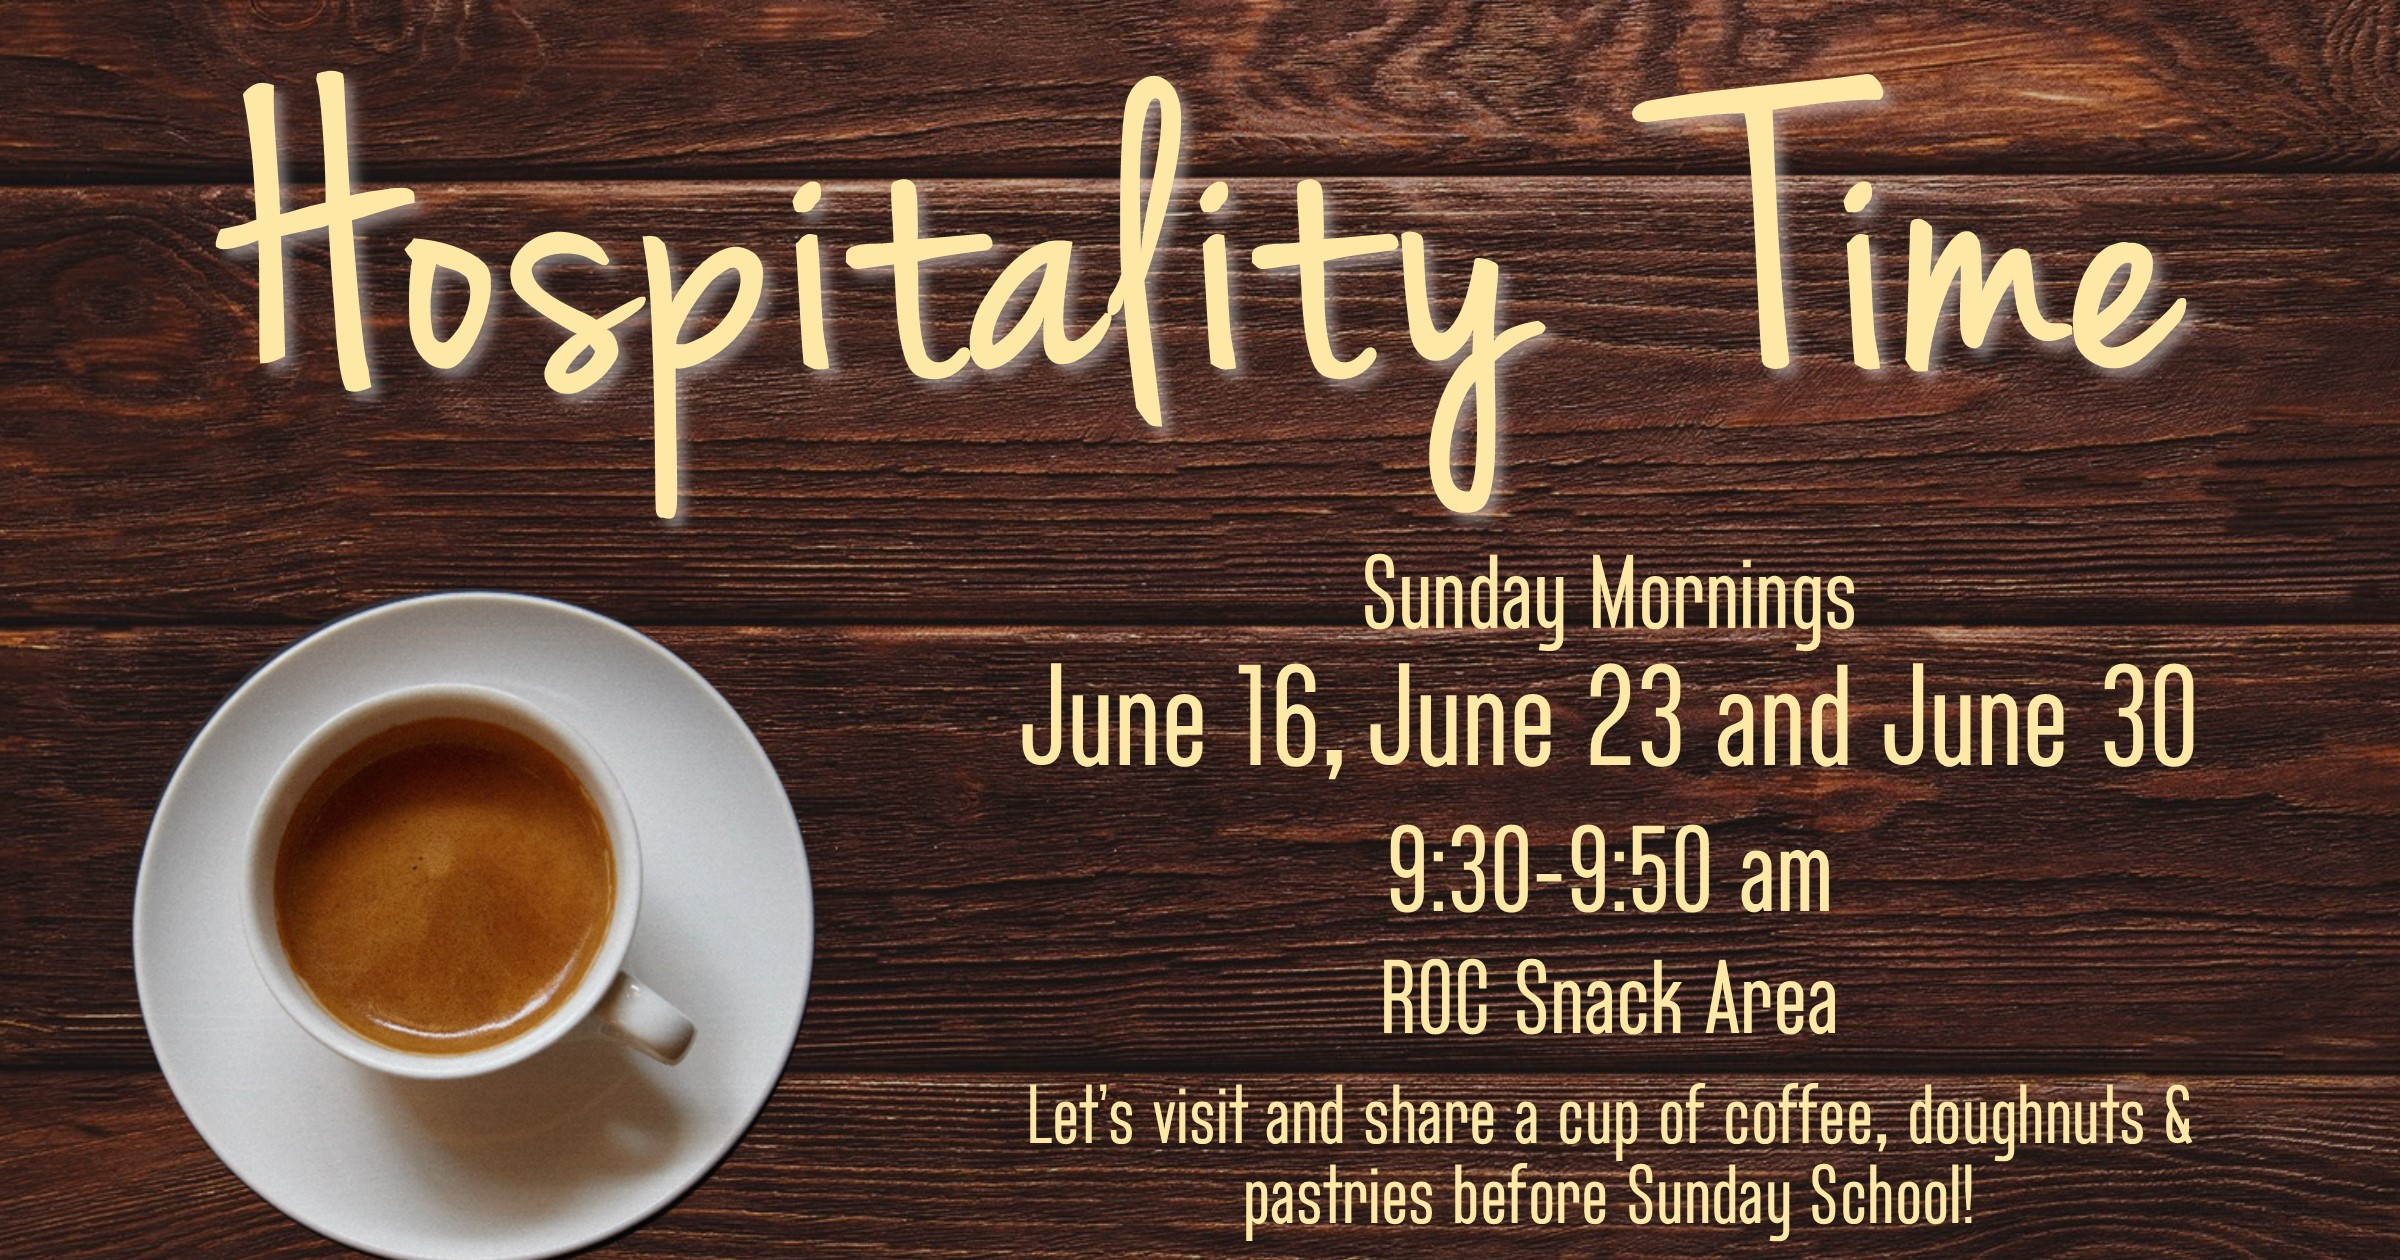 Hospitality Time FB.jpg